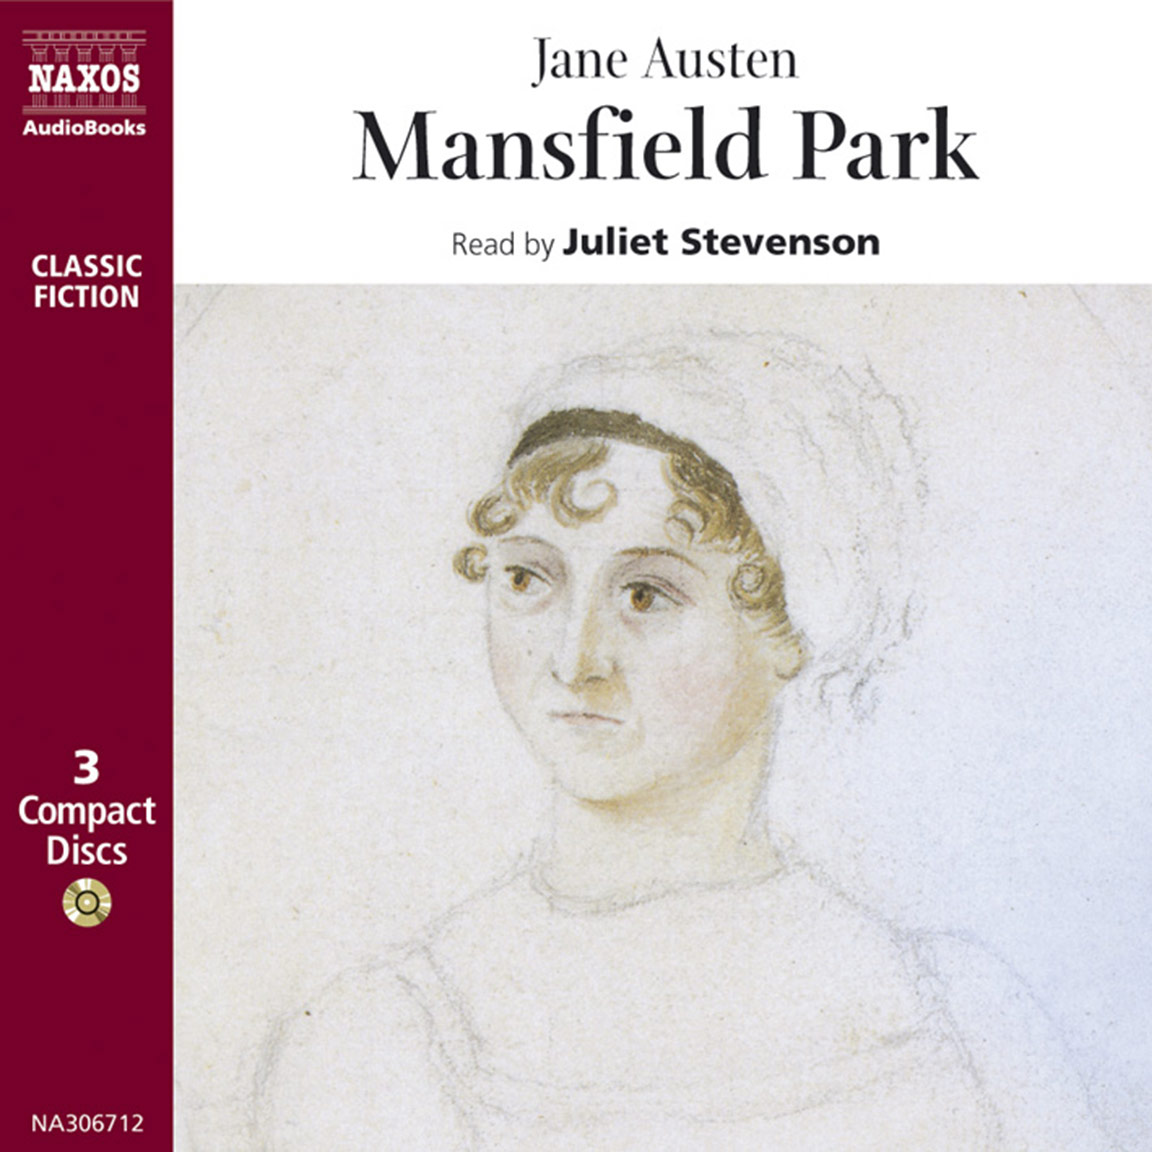 Mansfield Park (abridged)